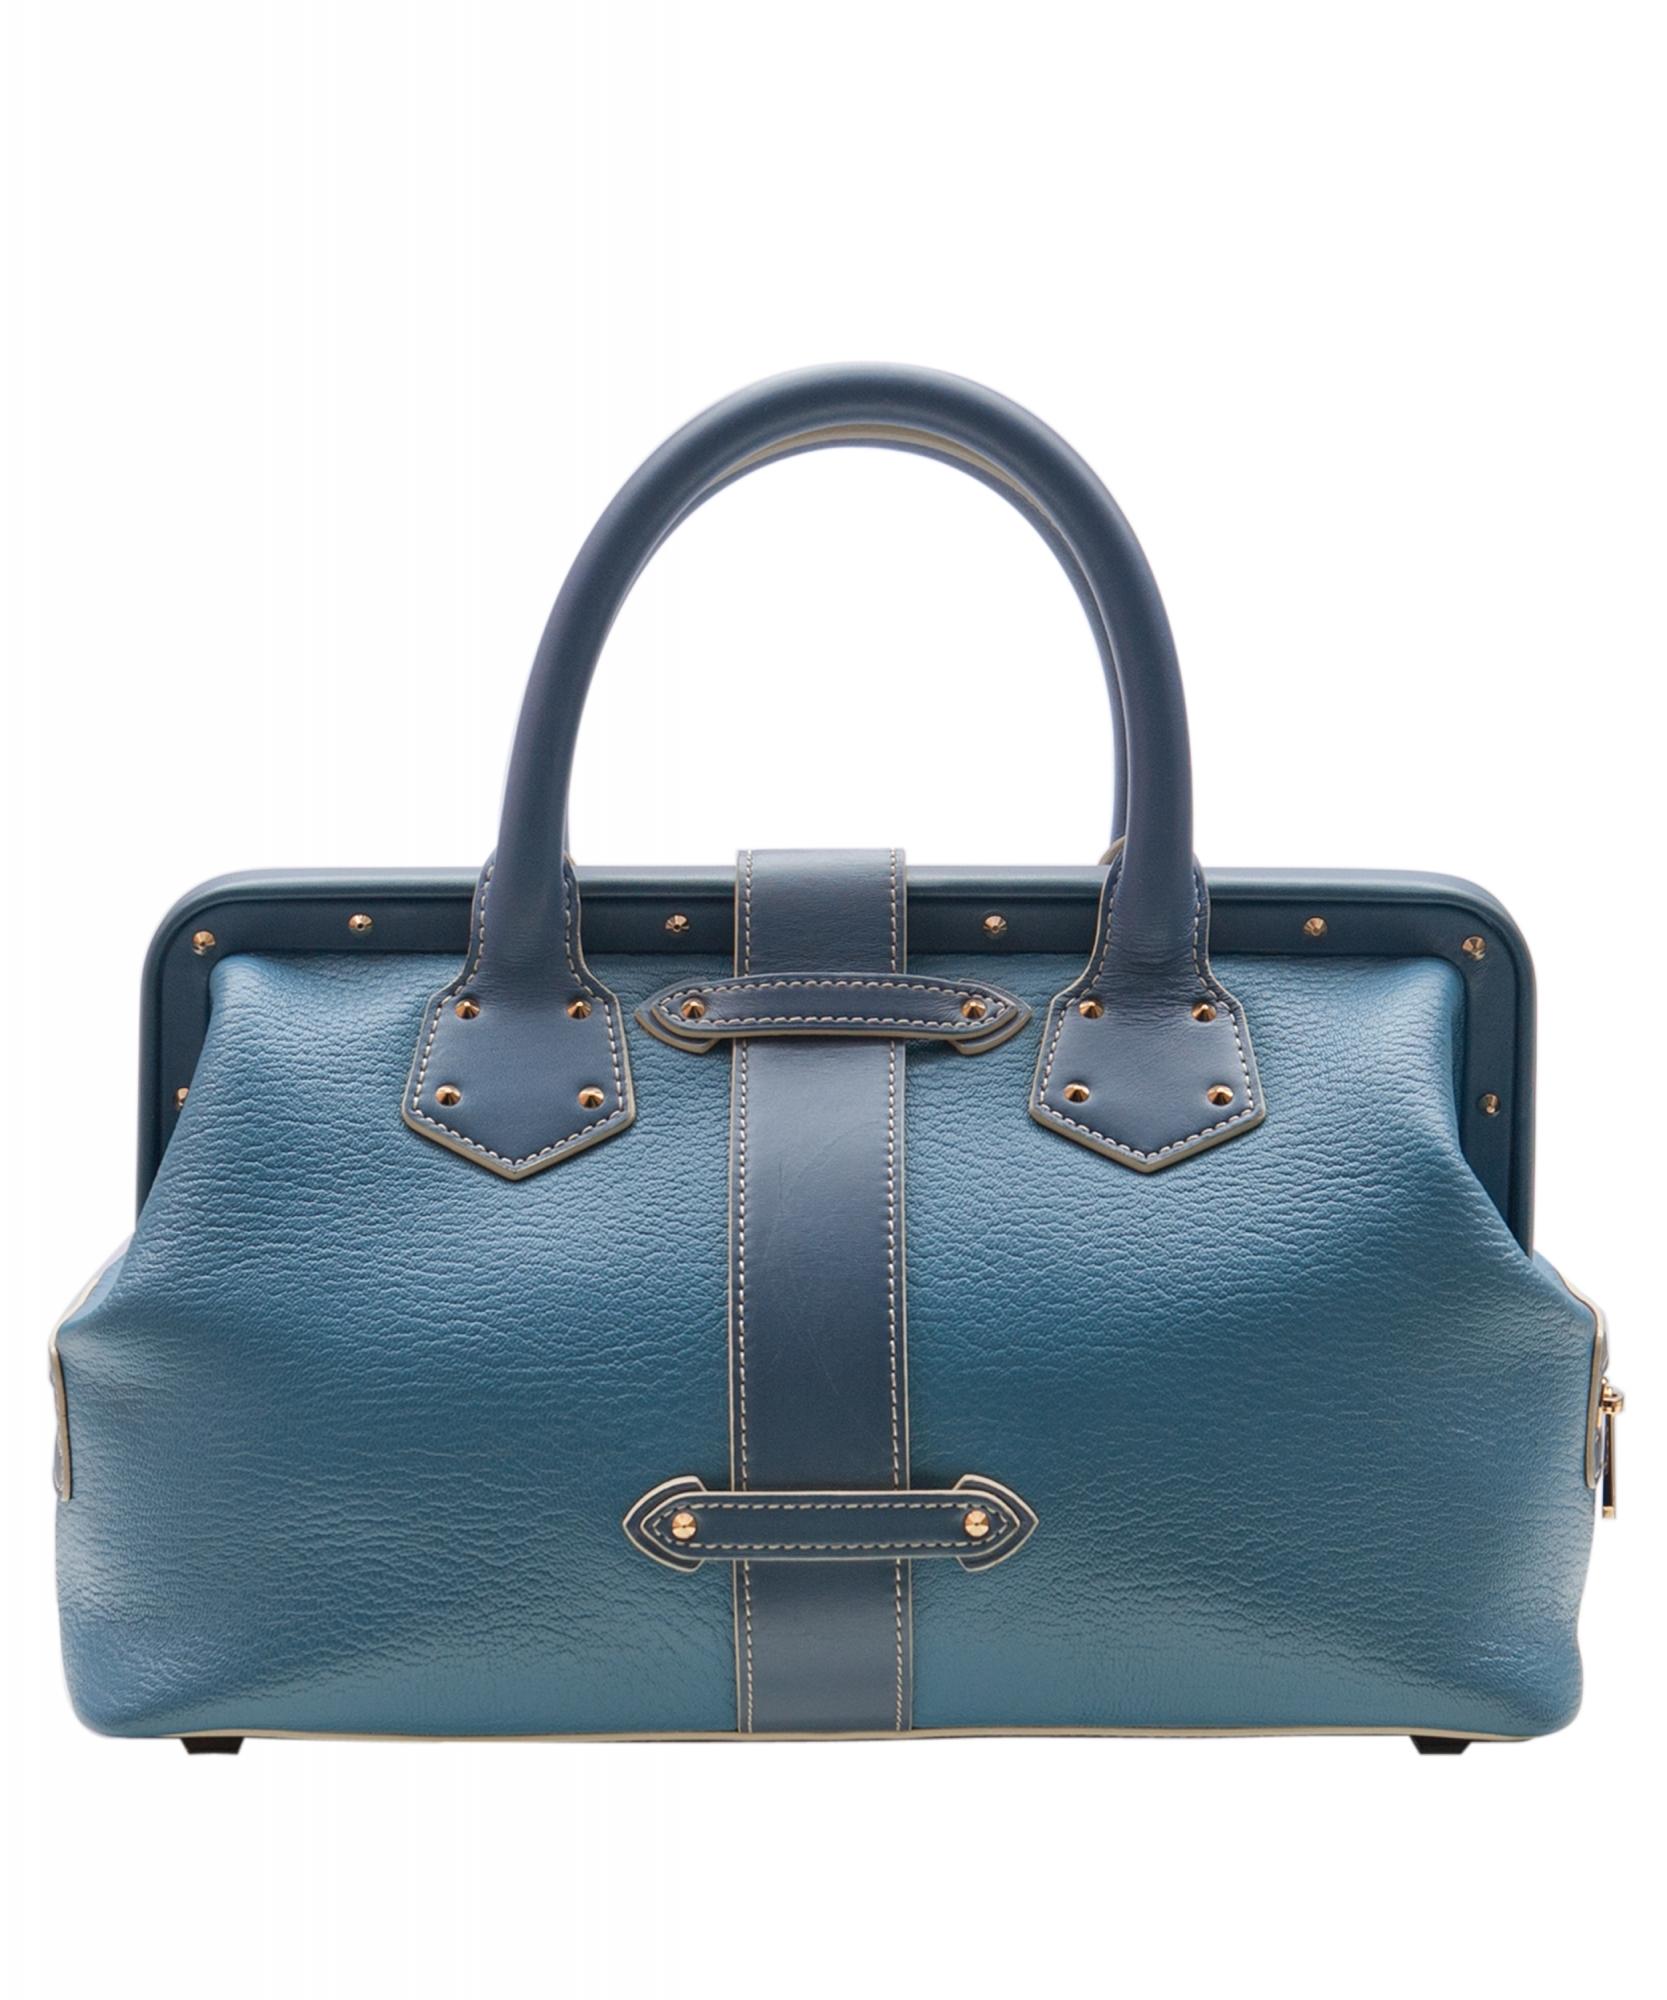 5cf2a2205e3 Louis Vuitton 'L'Ingenieux' PM Handtas | La Doyenne